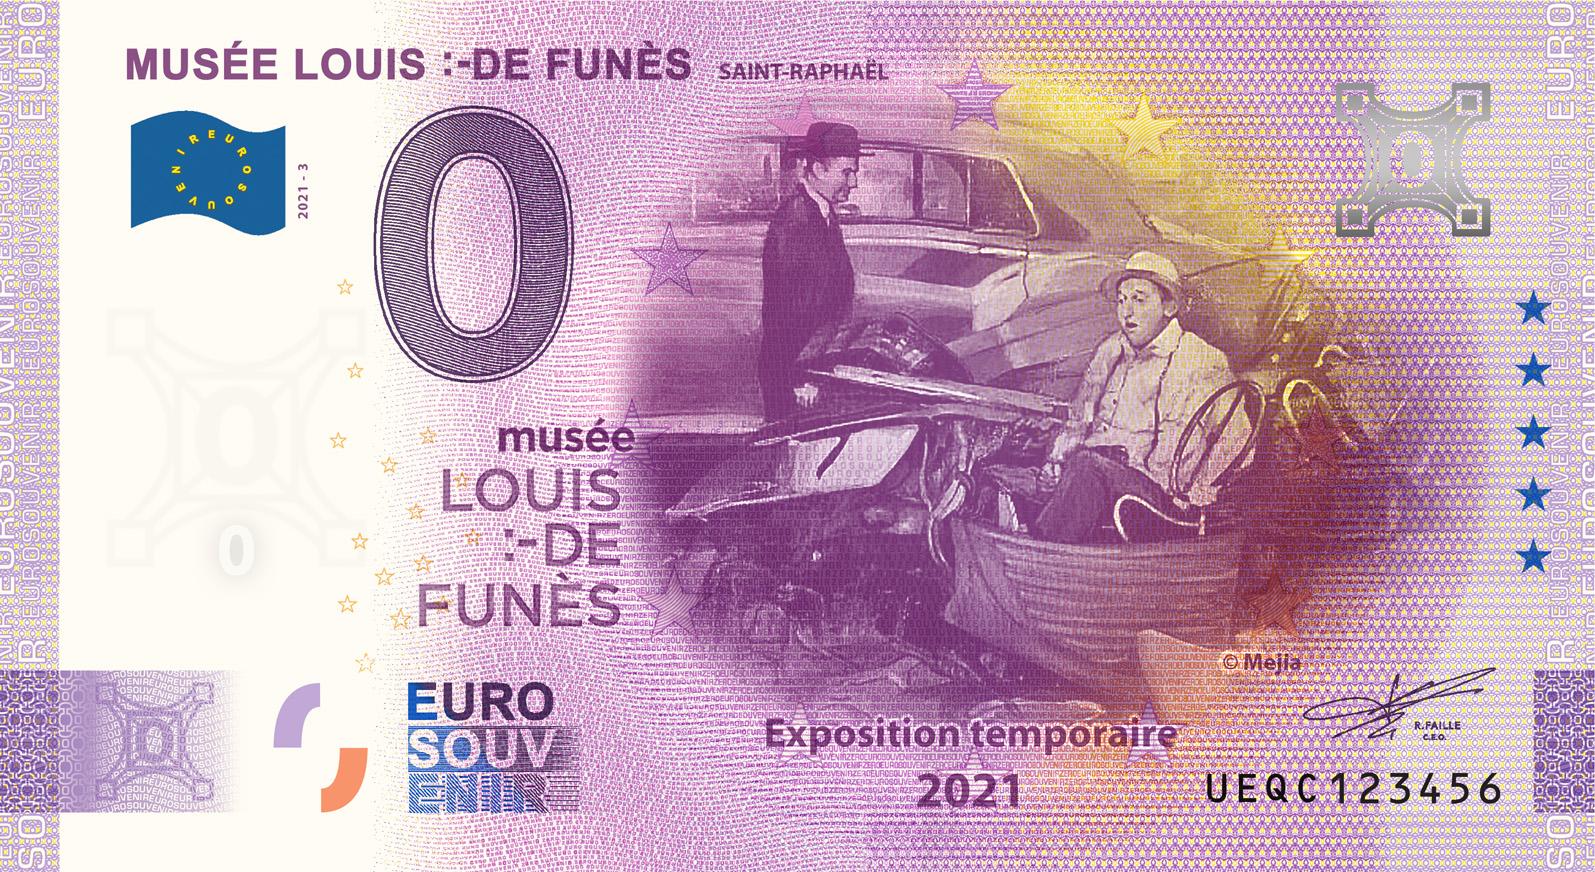 FRA_FRA_UEQC3_Musee_De_Funes_2021.jpg